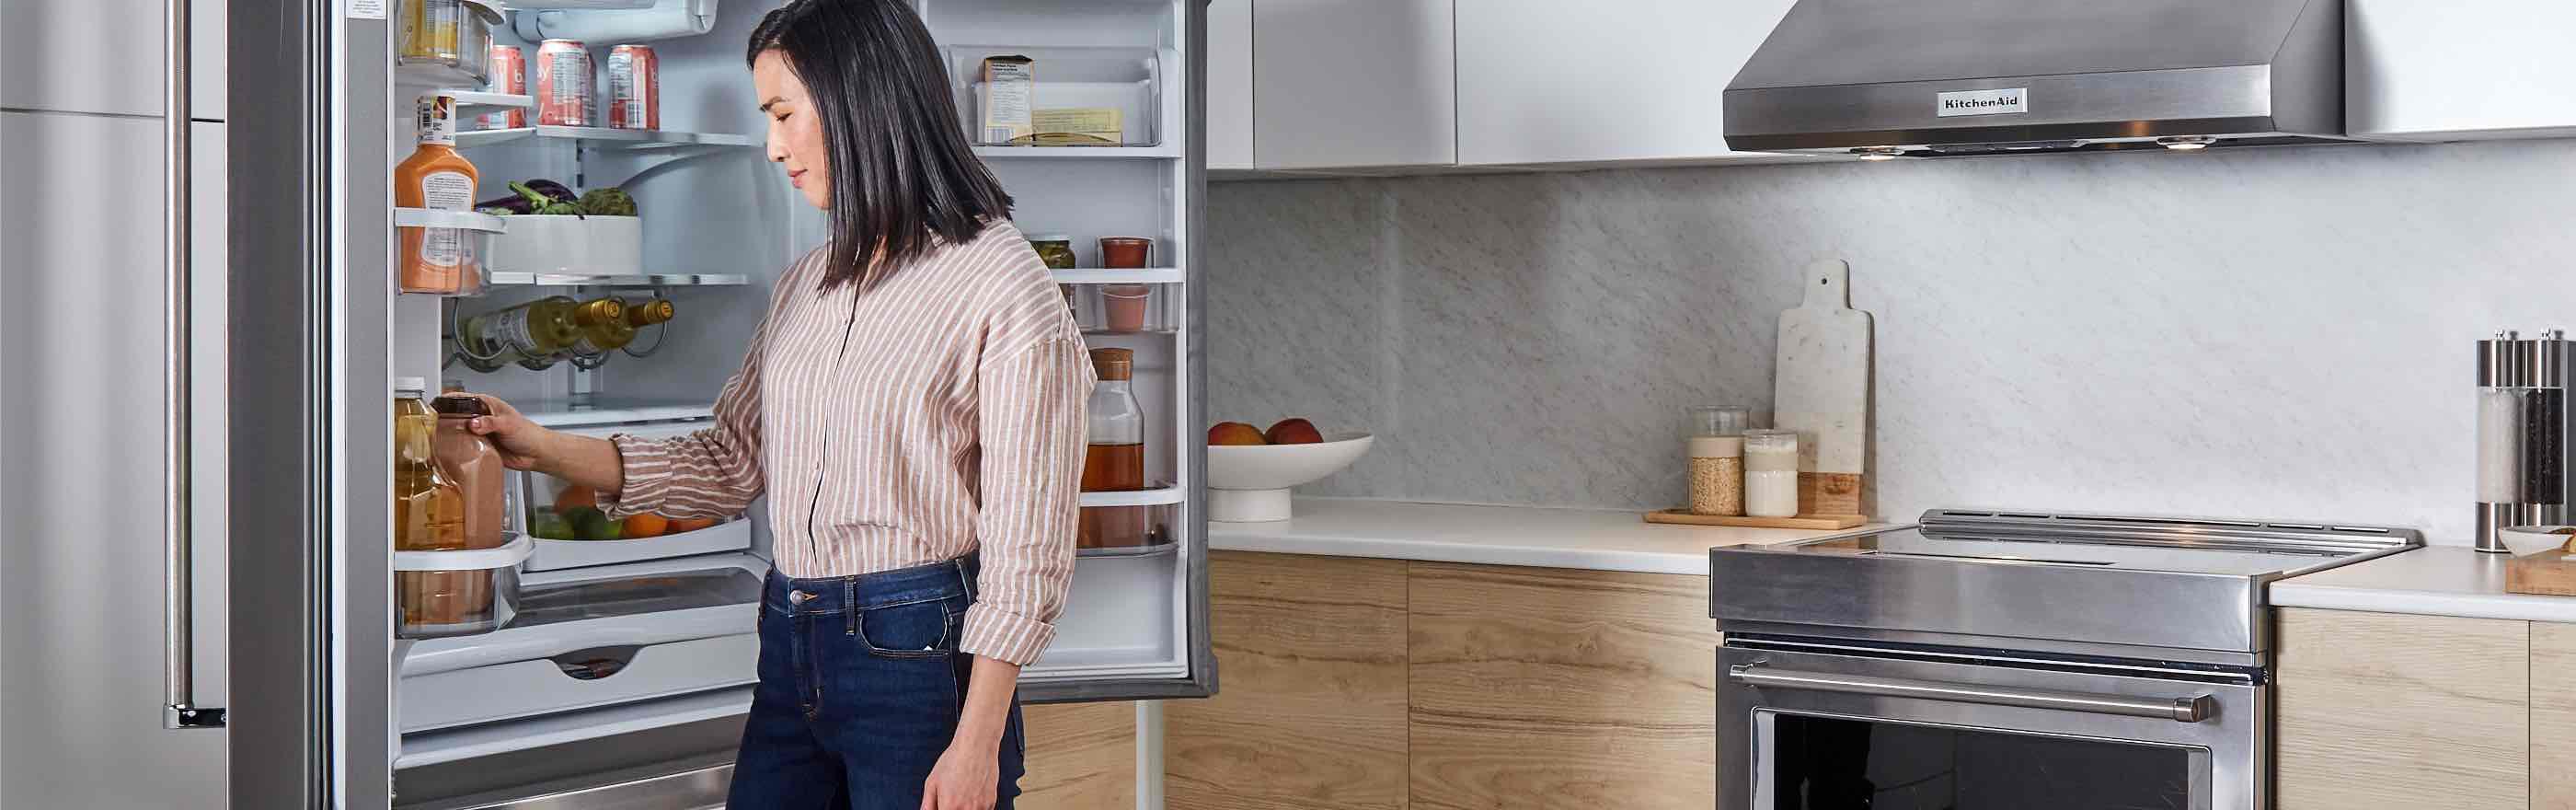 KitchenAid Cook Up the Savings